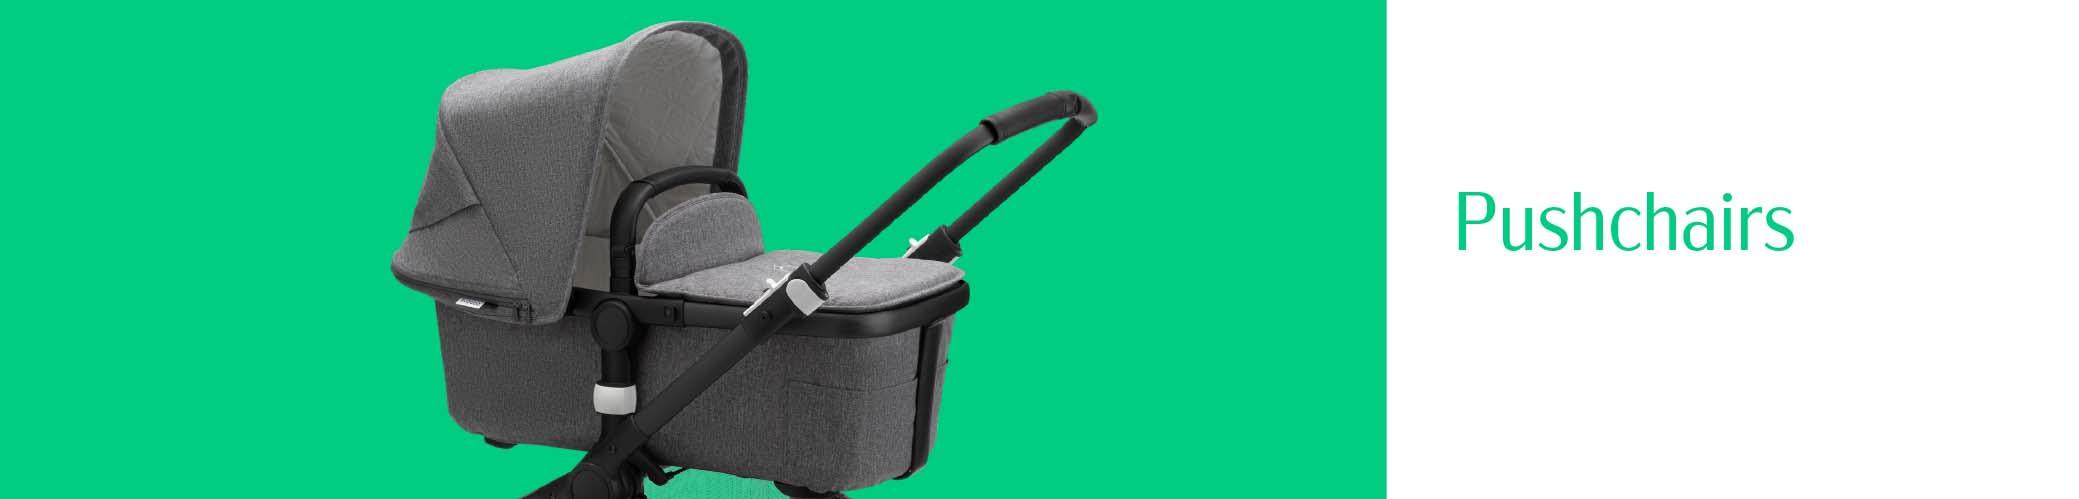 -05-pushchairs-internalbanner-may21.jpg